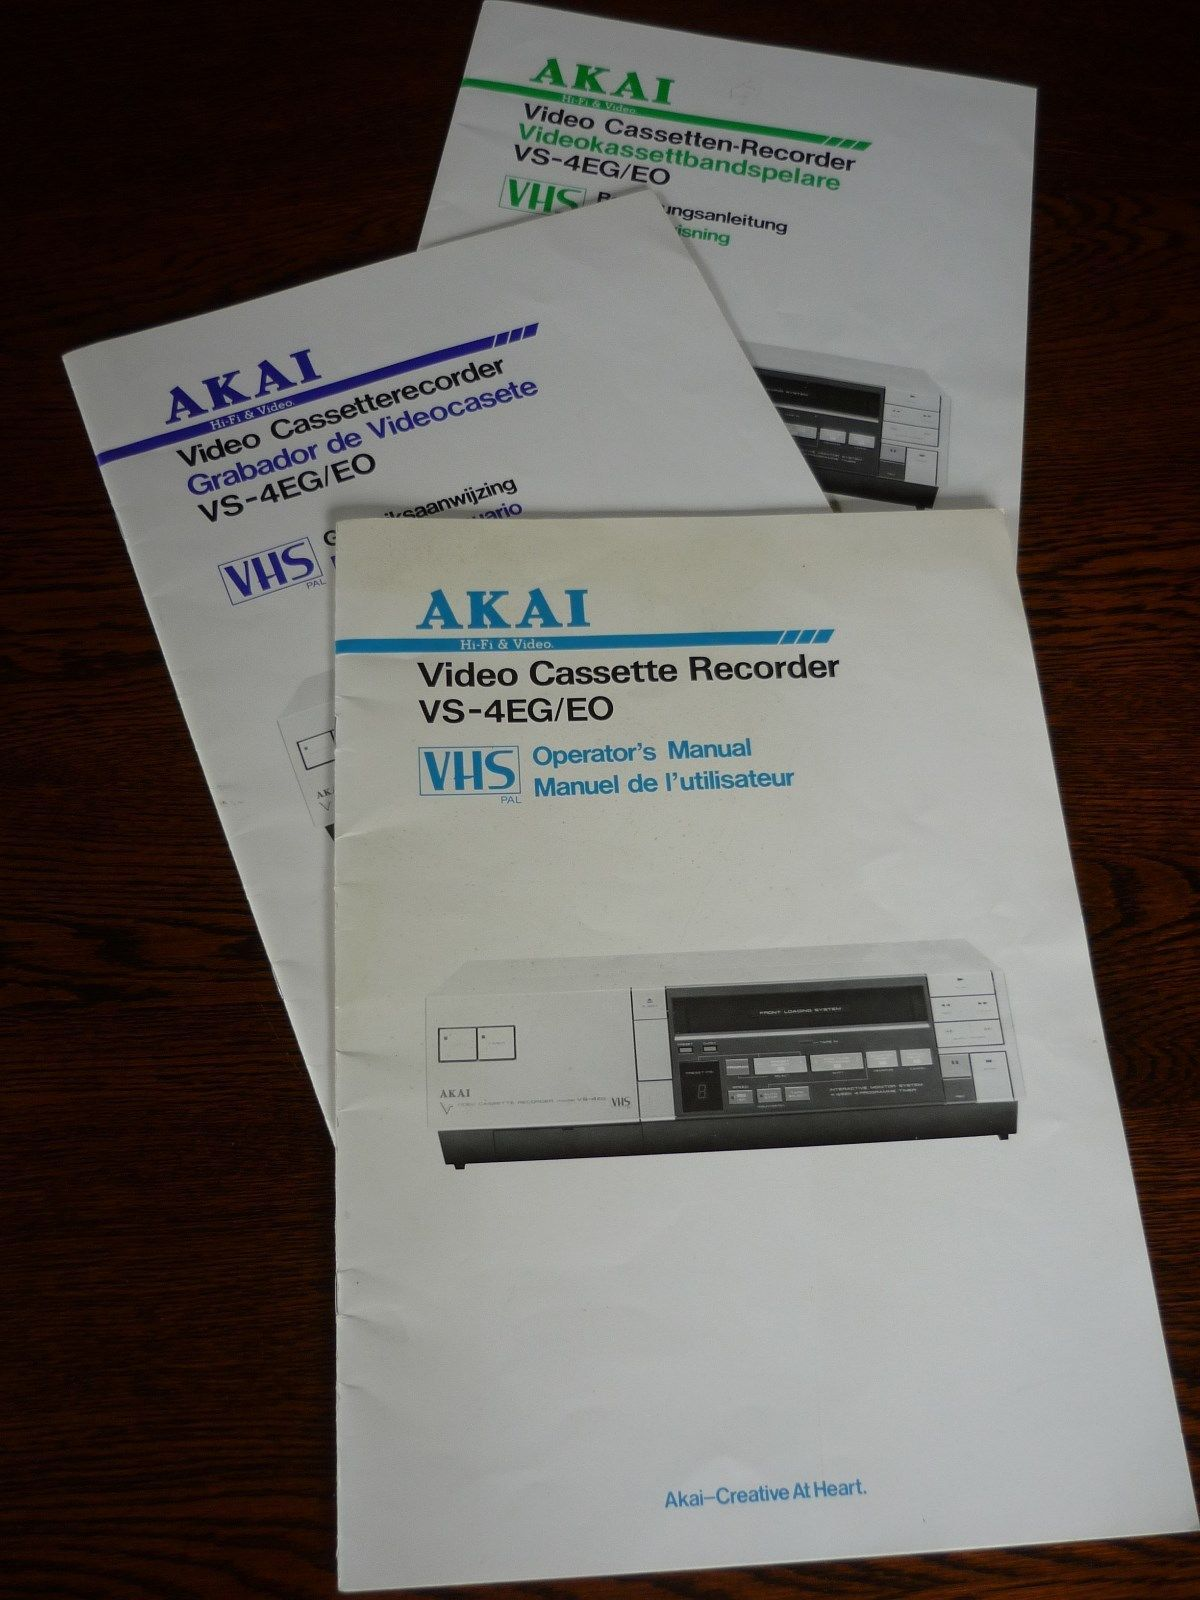 vintage akai vcr video cassette recorder vs 4eg faulty ebay rh pinterest co uk 3330 Old VCR Akai Sharp VCR